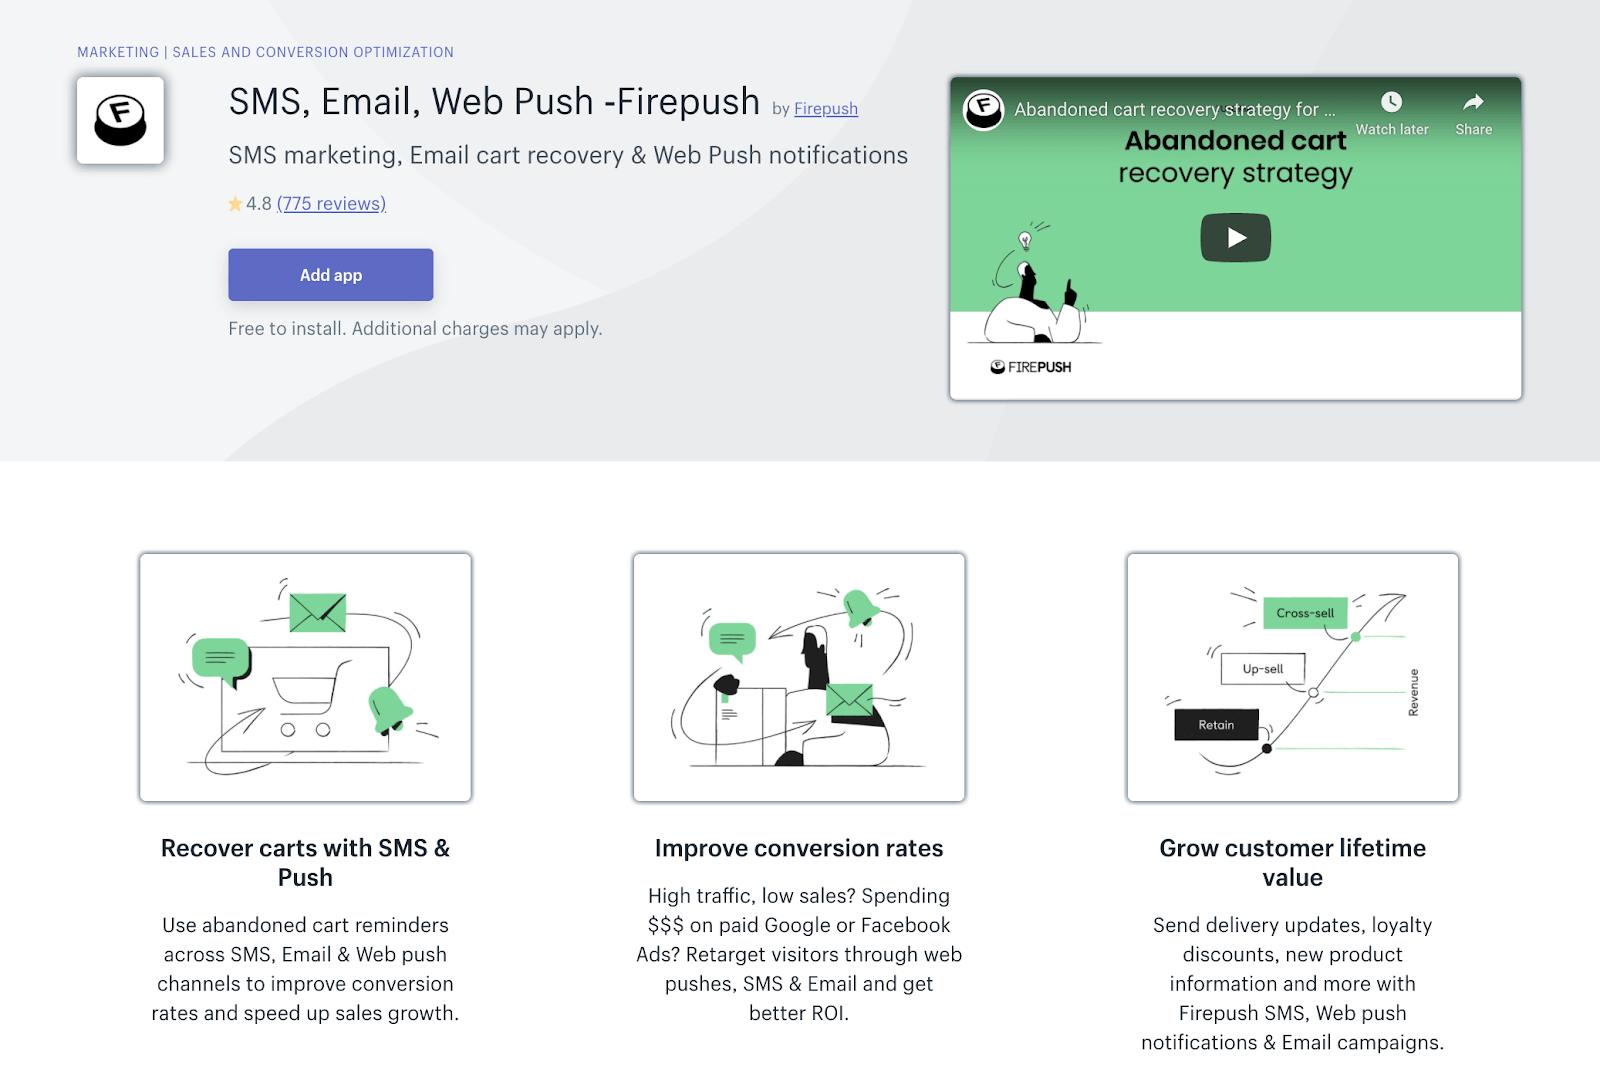 Firepush Shopify application page